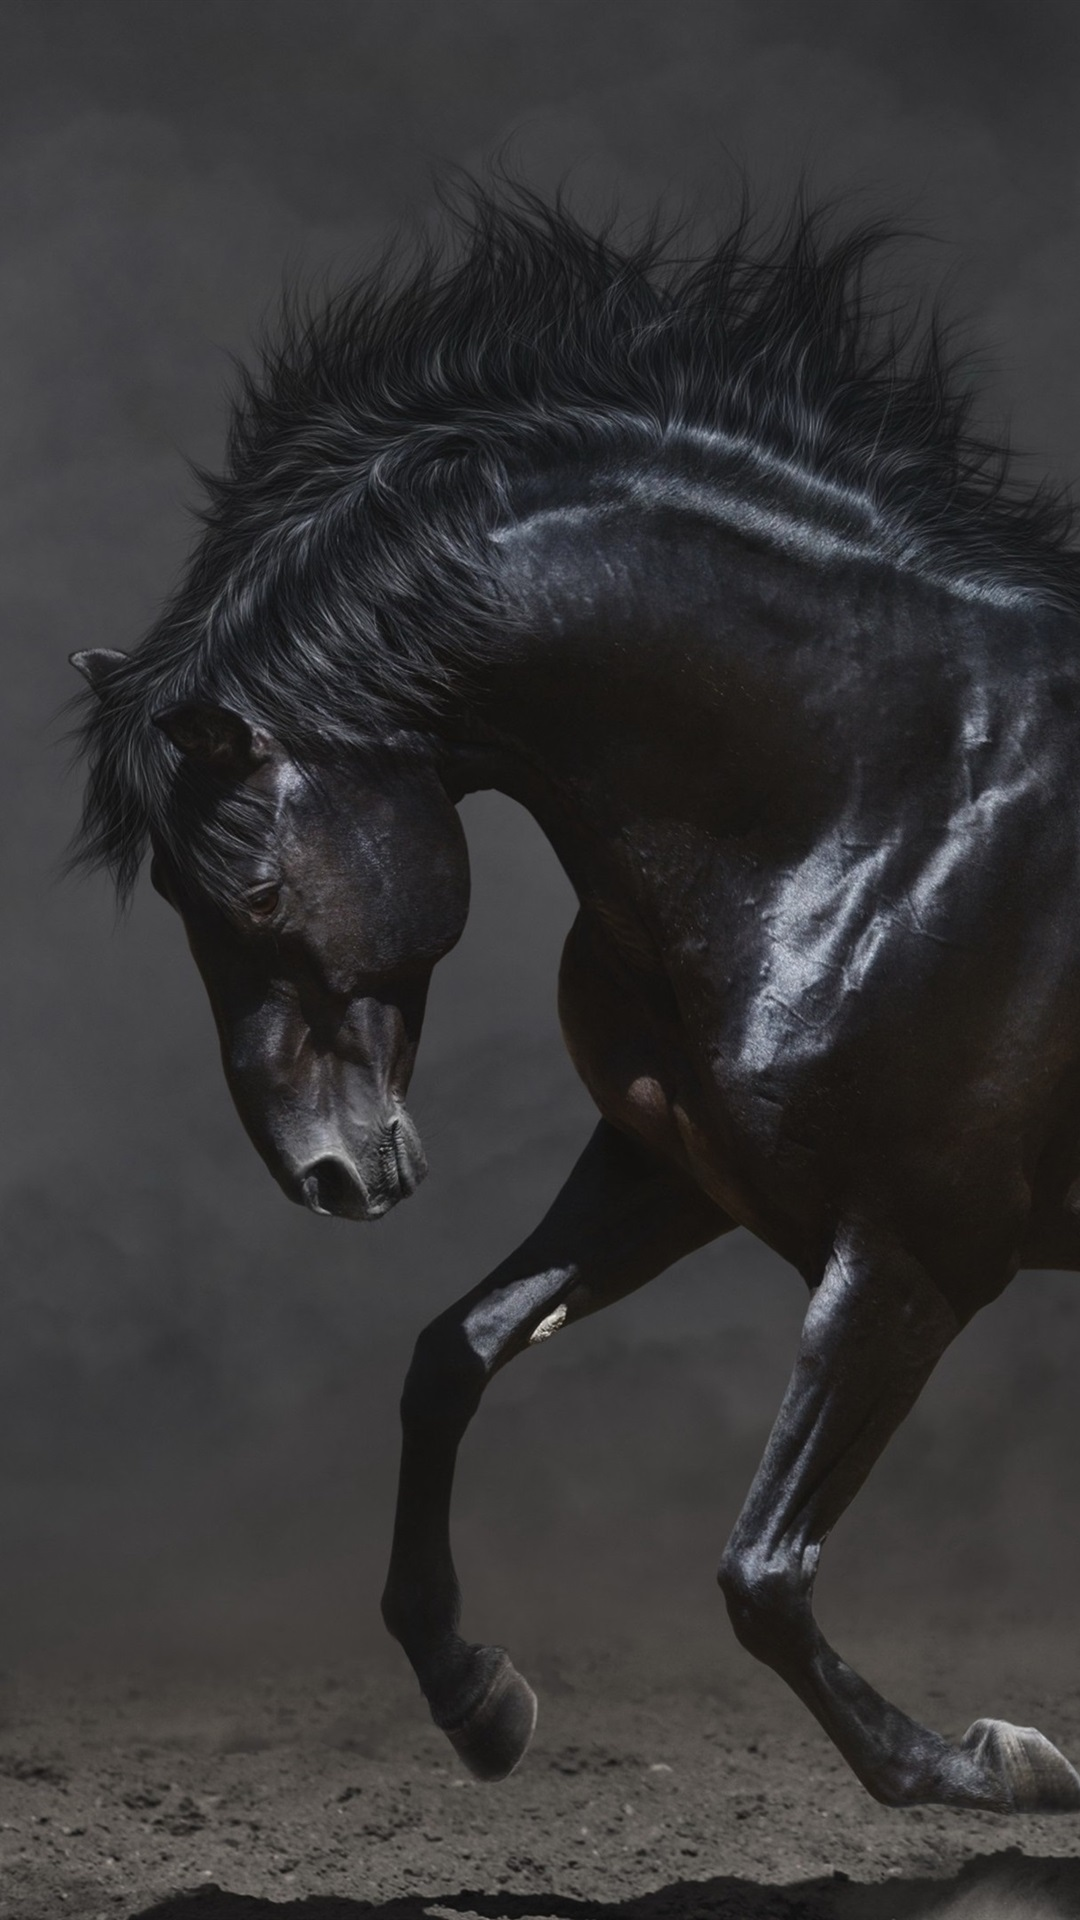 Black Horse Run In The Dark 1080x1920 Iphone 8 7 6 6s Plus